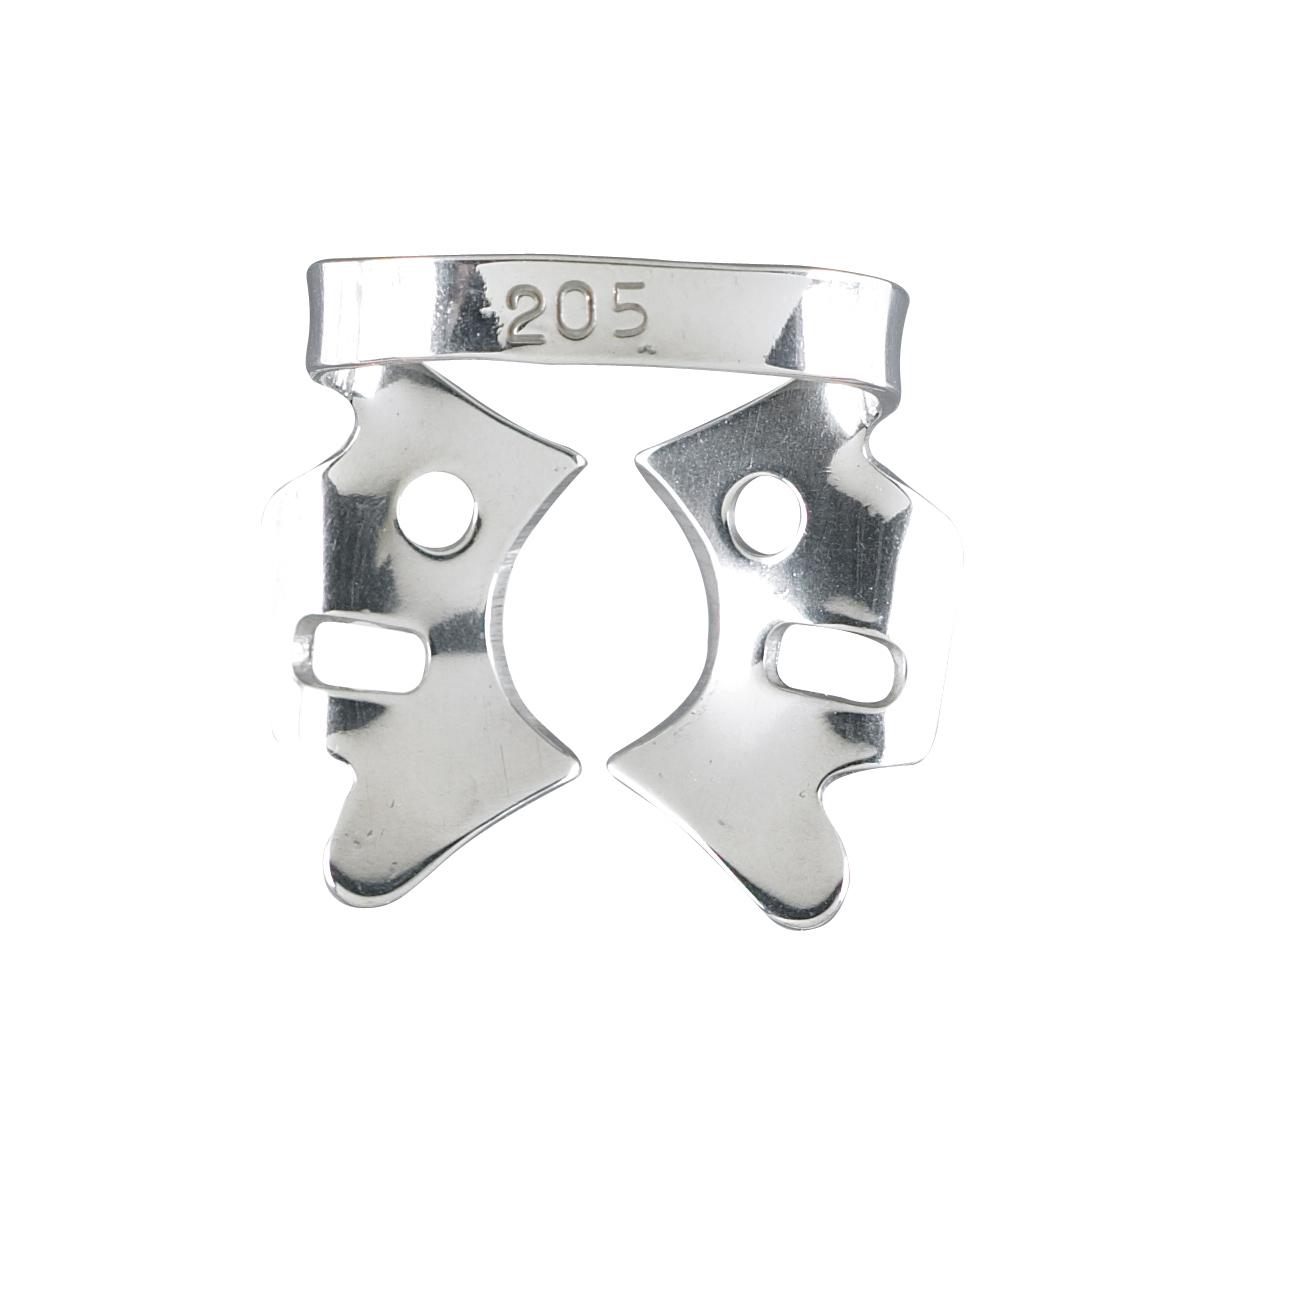 dental-dam-clamp-style-205-76d-205-miltex.jpg